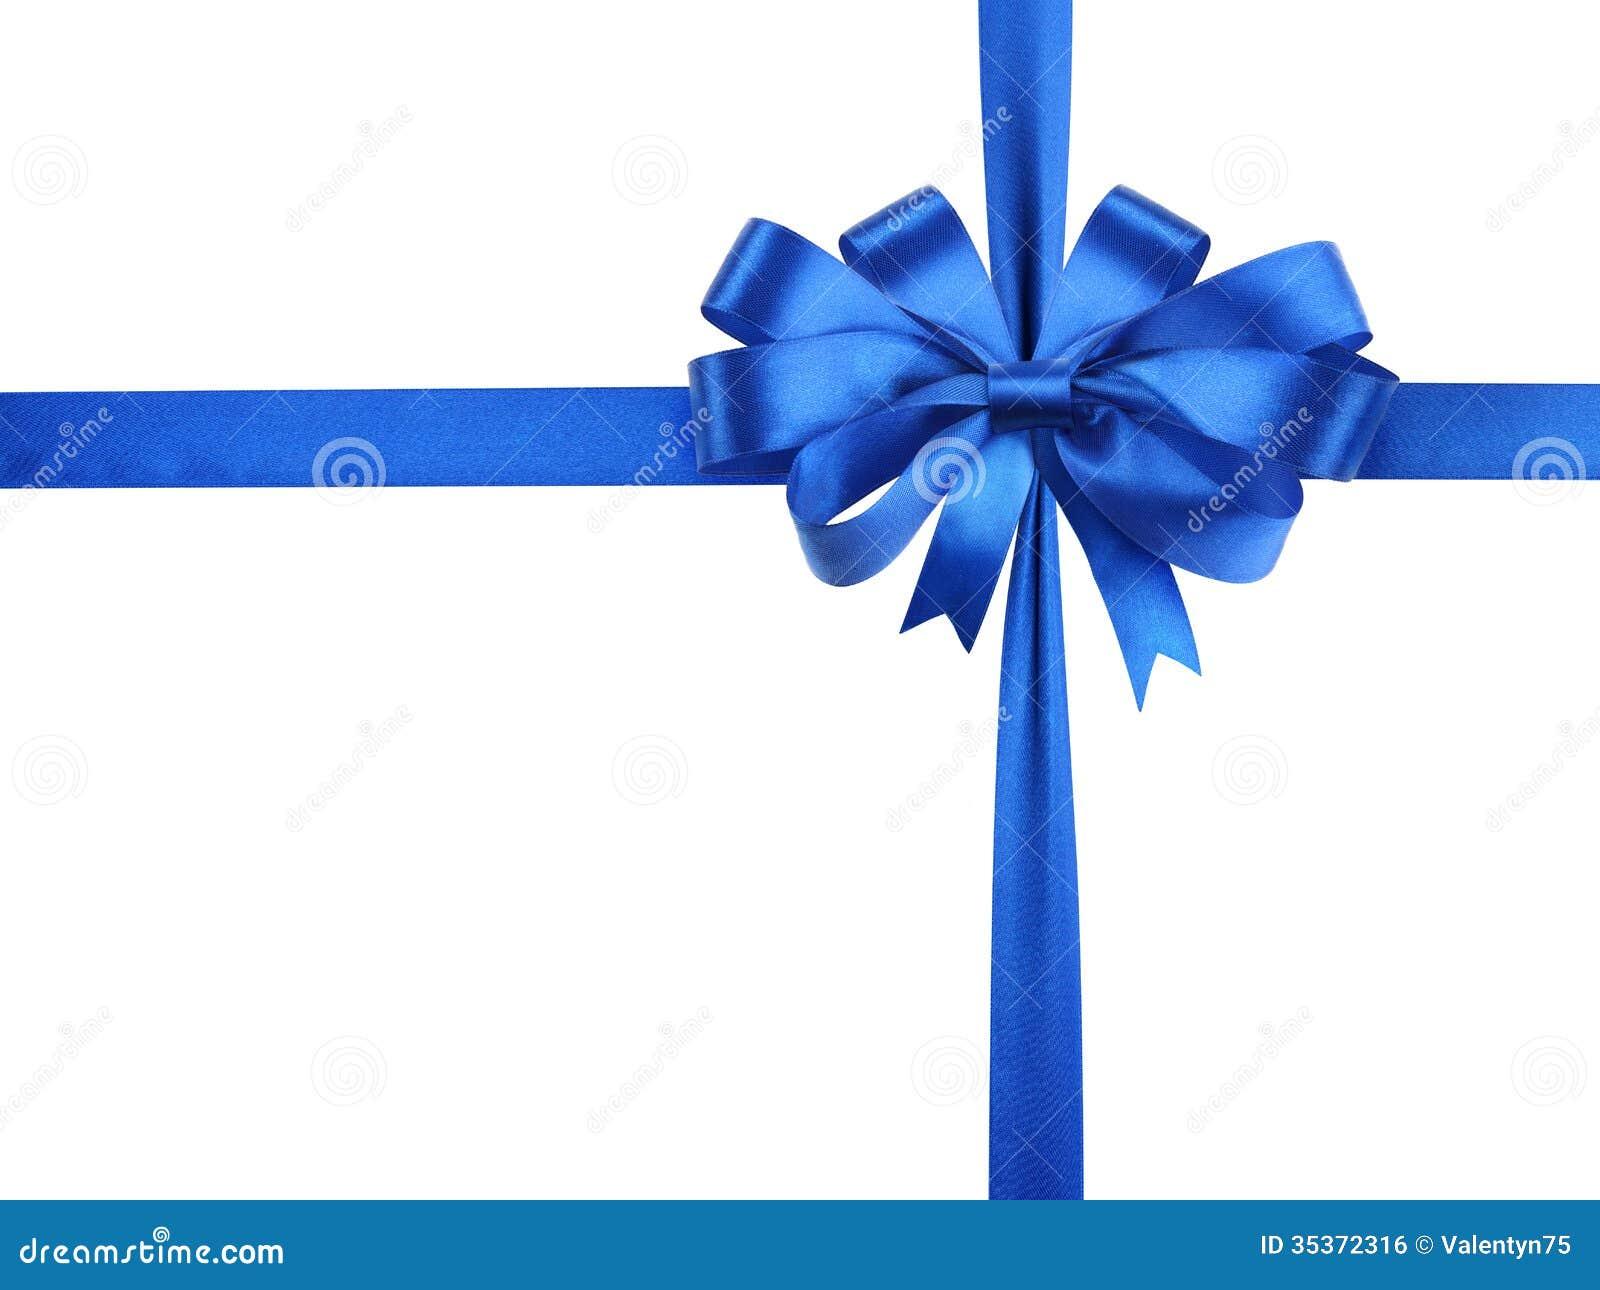 bowknot de ruban bleu photo stock image du valentine bow clipart no background bow clipart without backgound